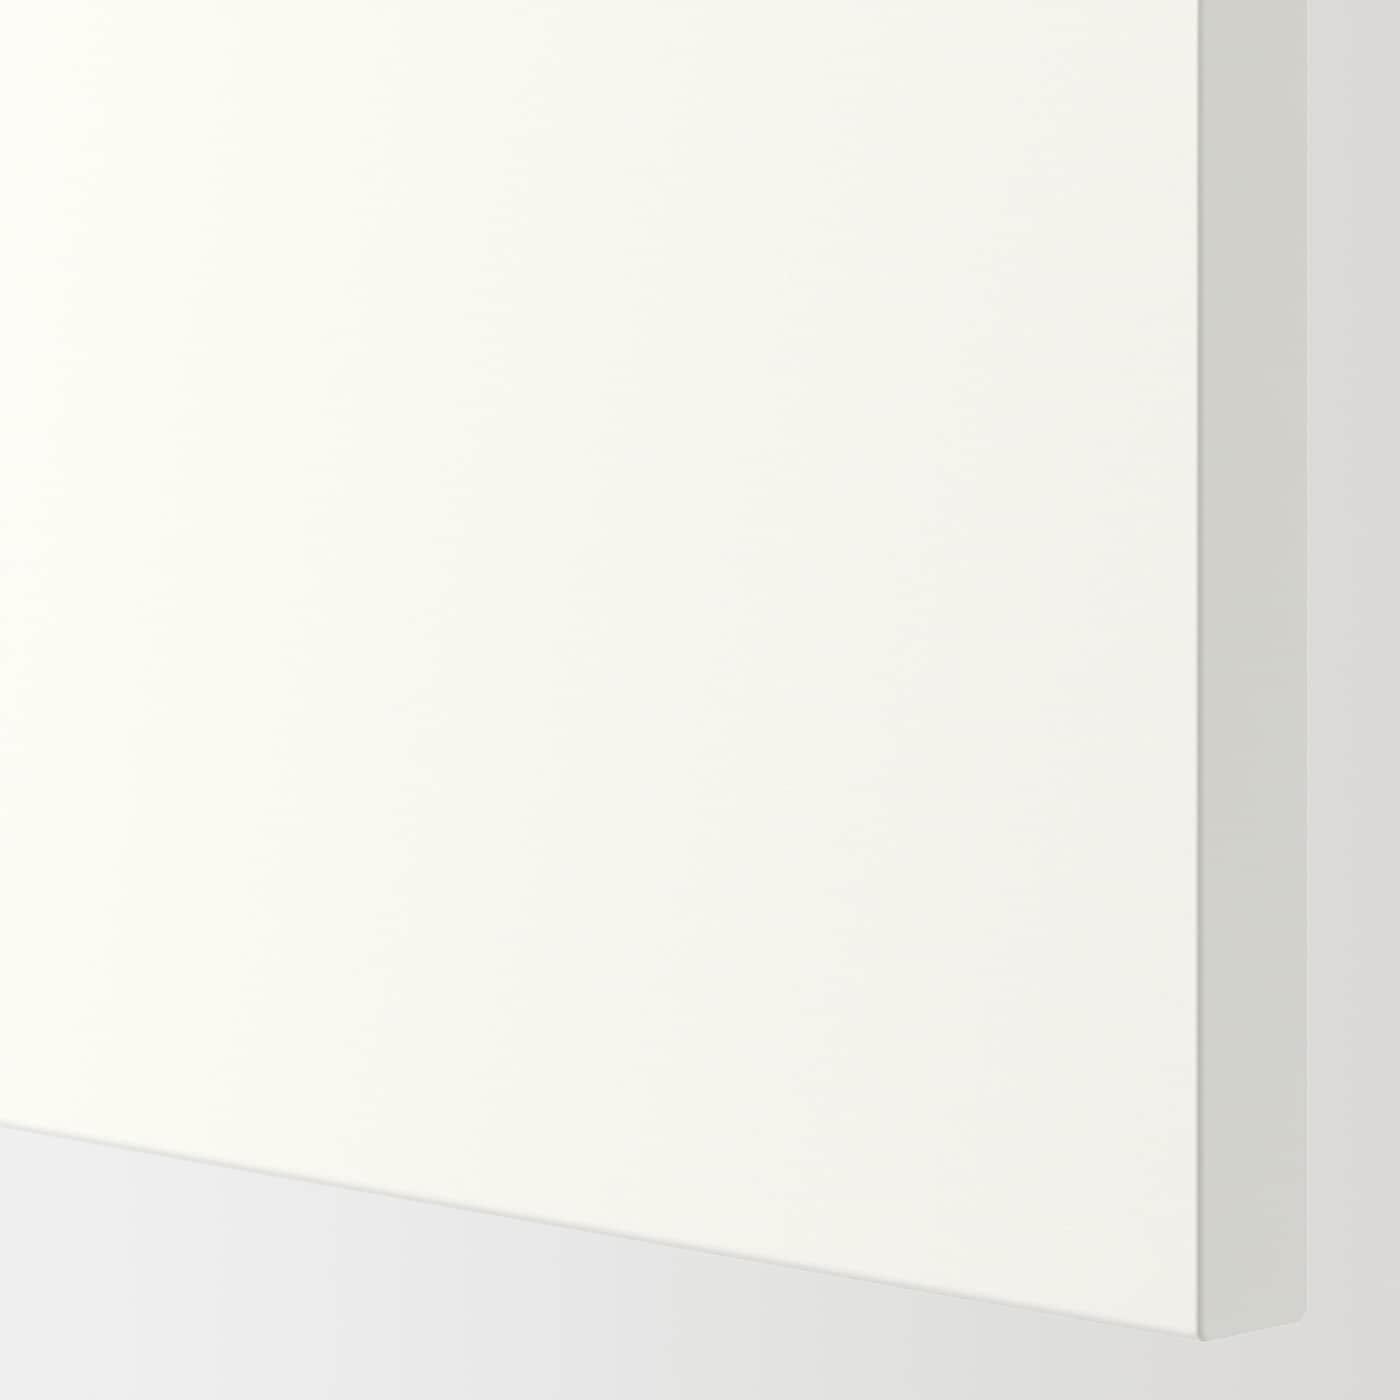 ENHET Wall cb w 2 shlvs/doors, white, 80x32x75 cm